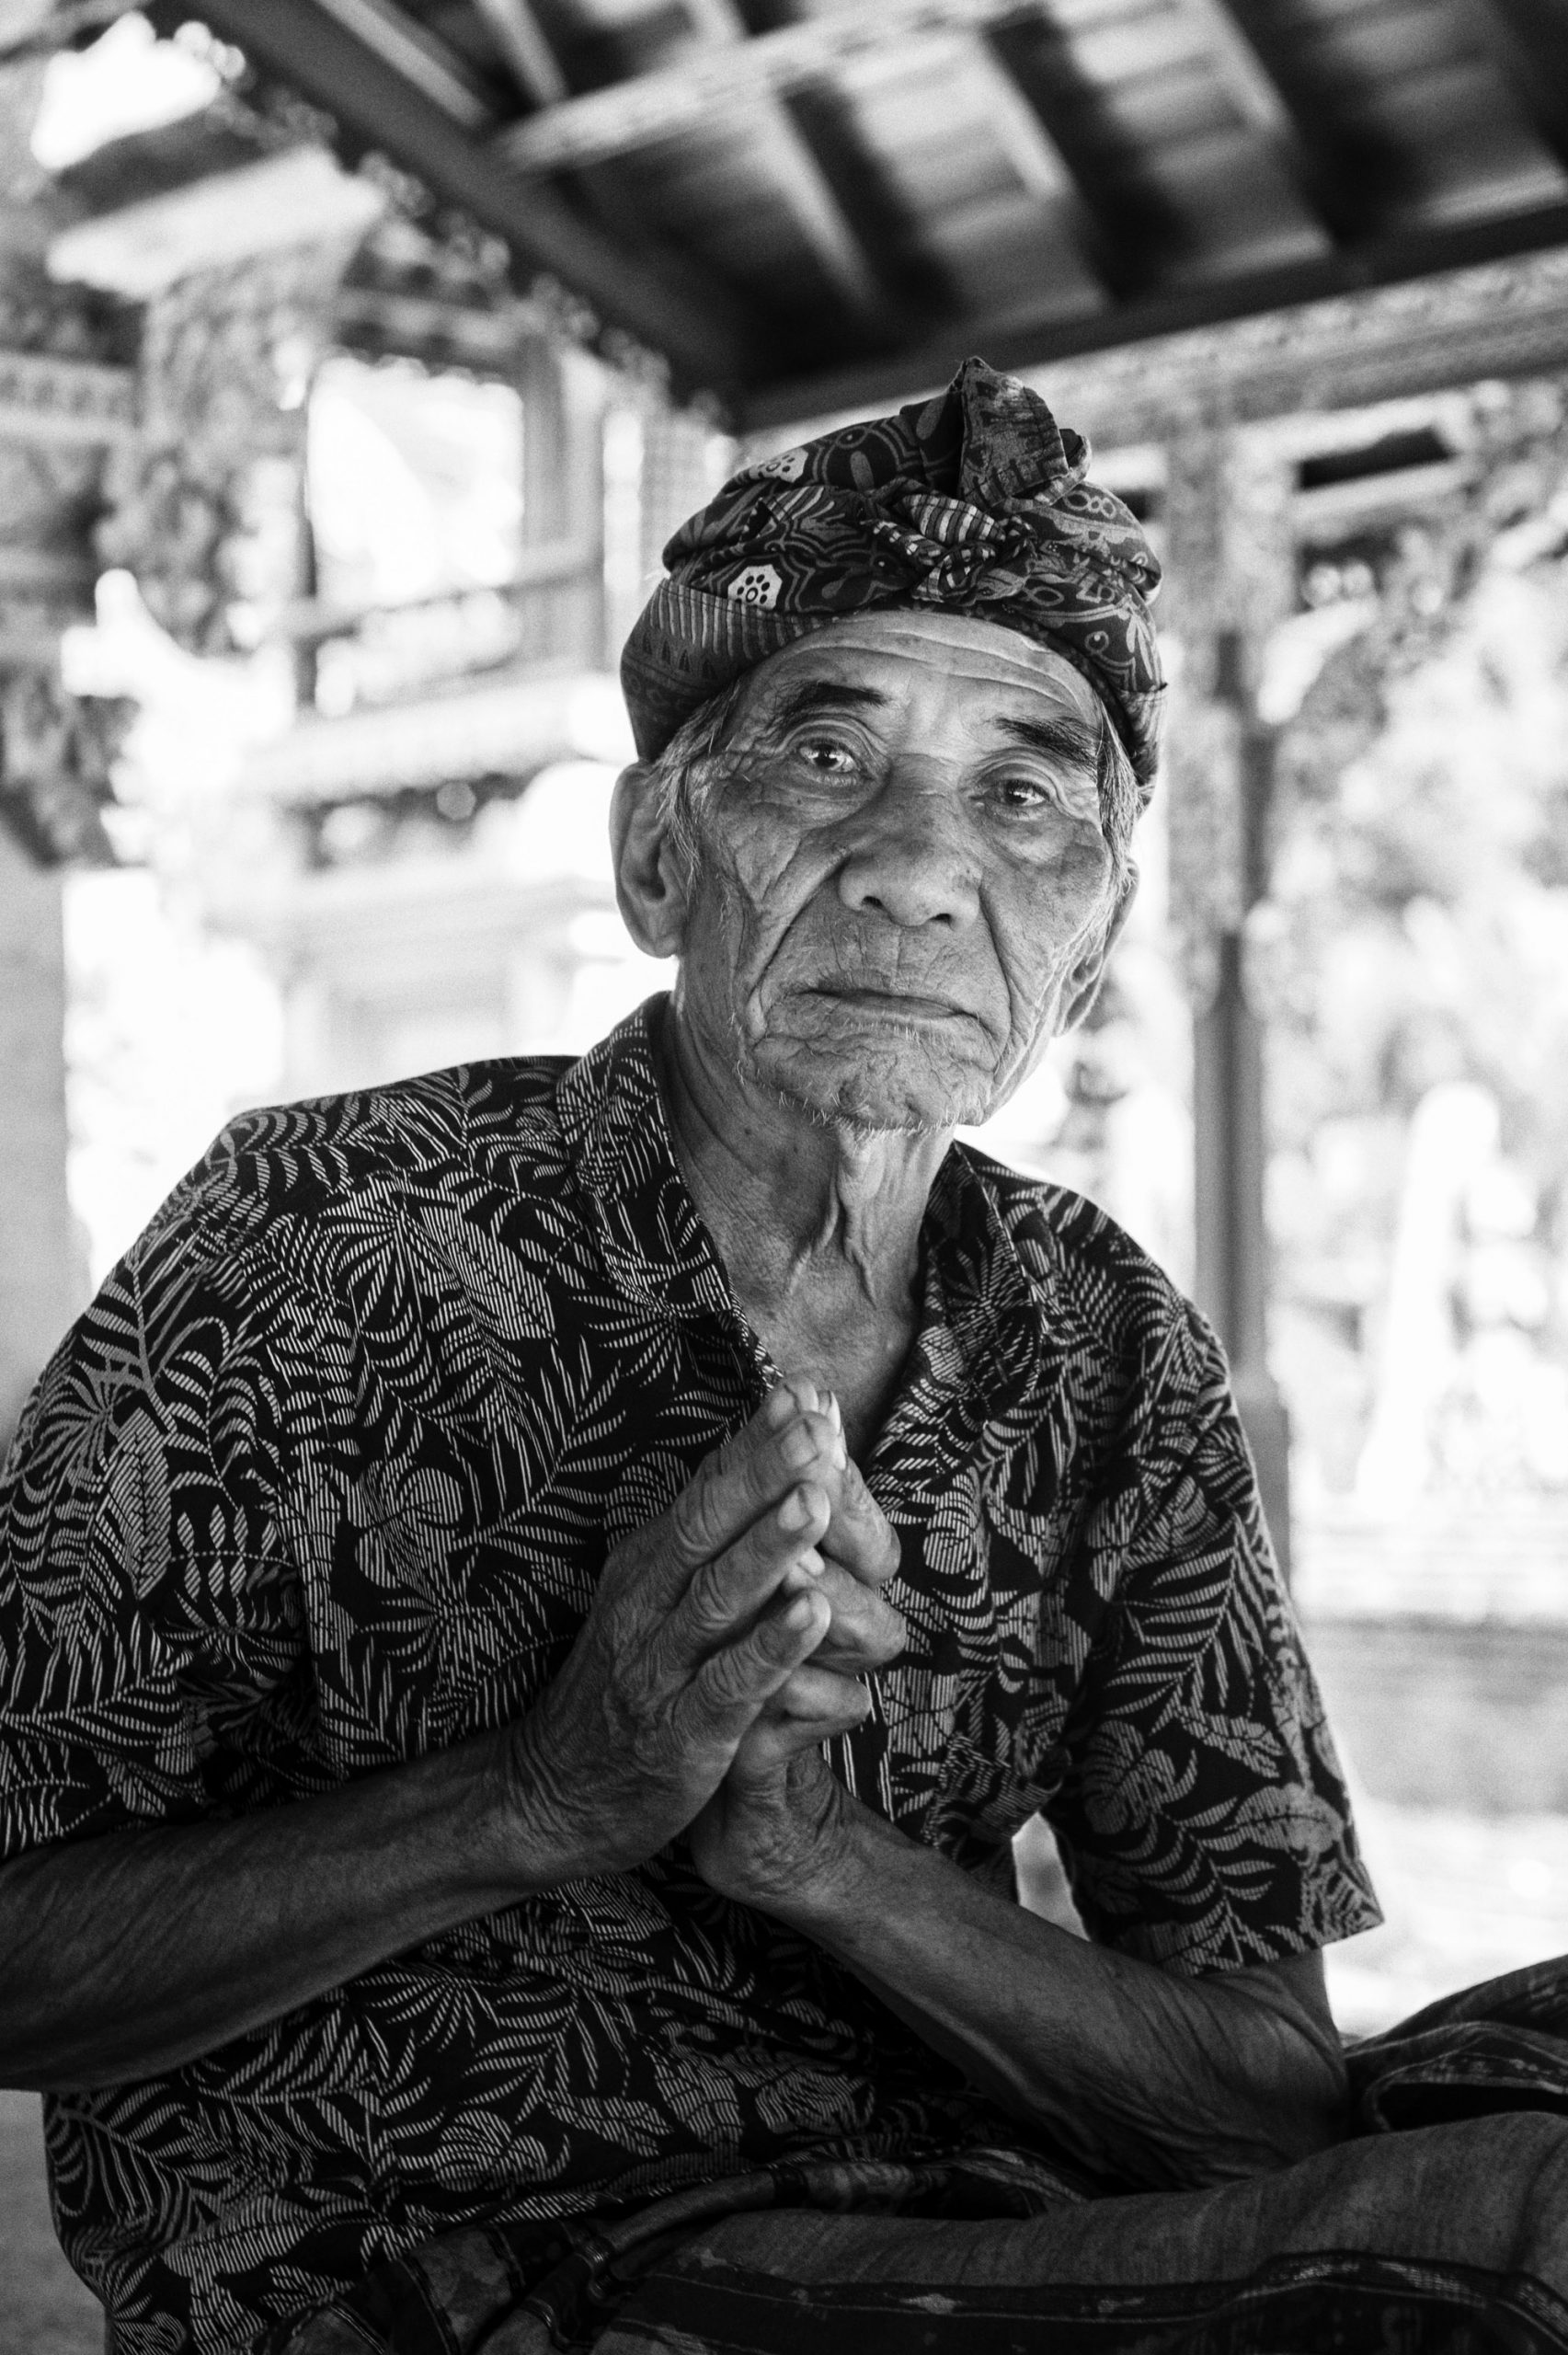 Categorie: Landscape & Nature, Portrait, Reportage; Photographer: AURORA LIPERINI; Location: Bali, Indonesia